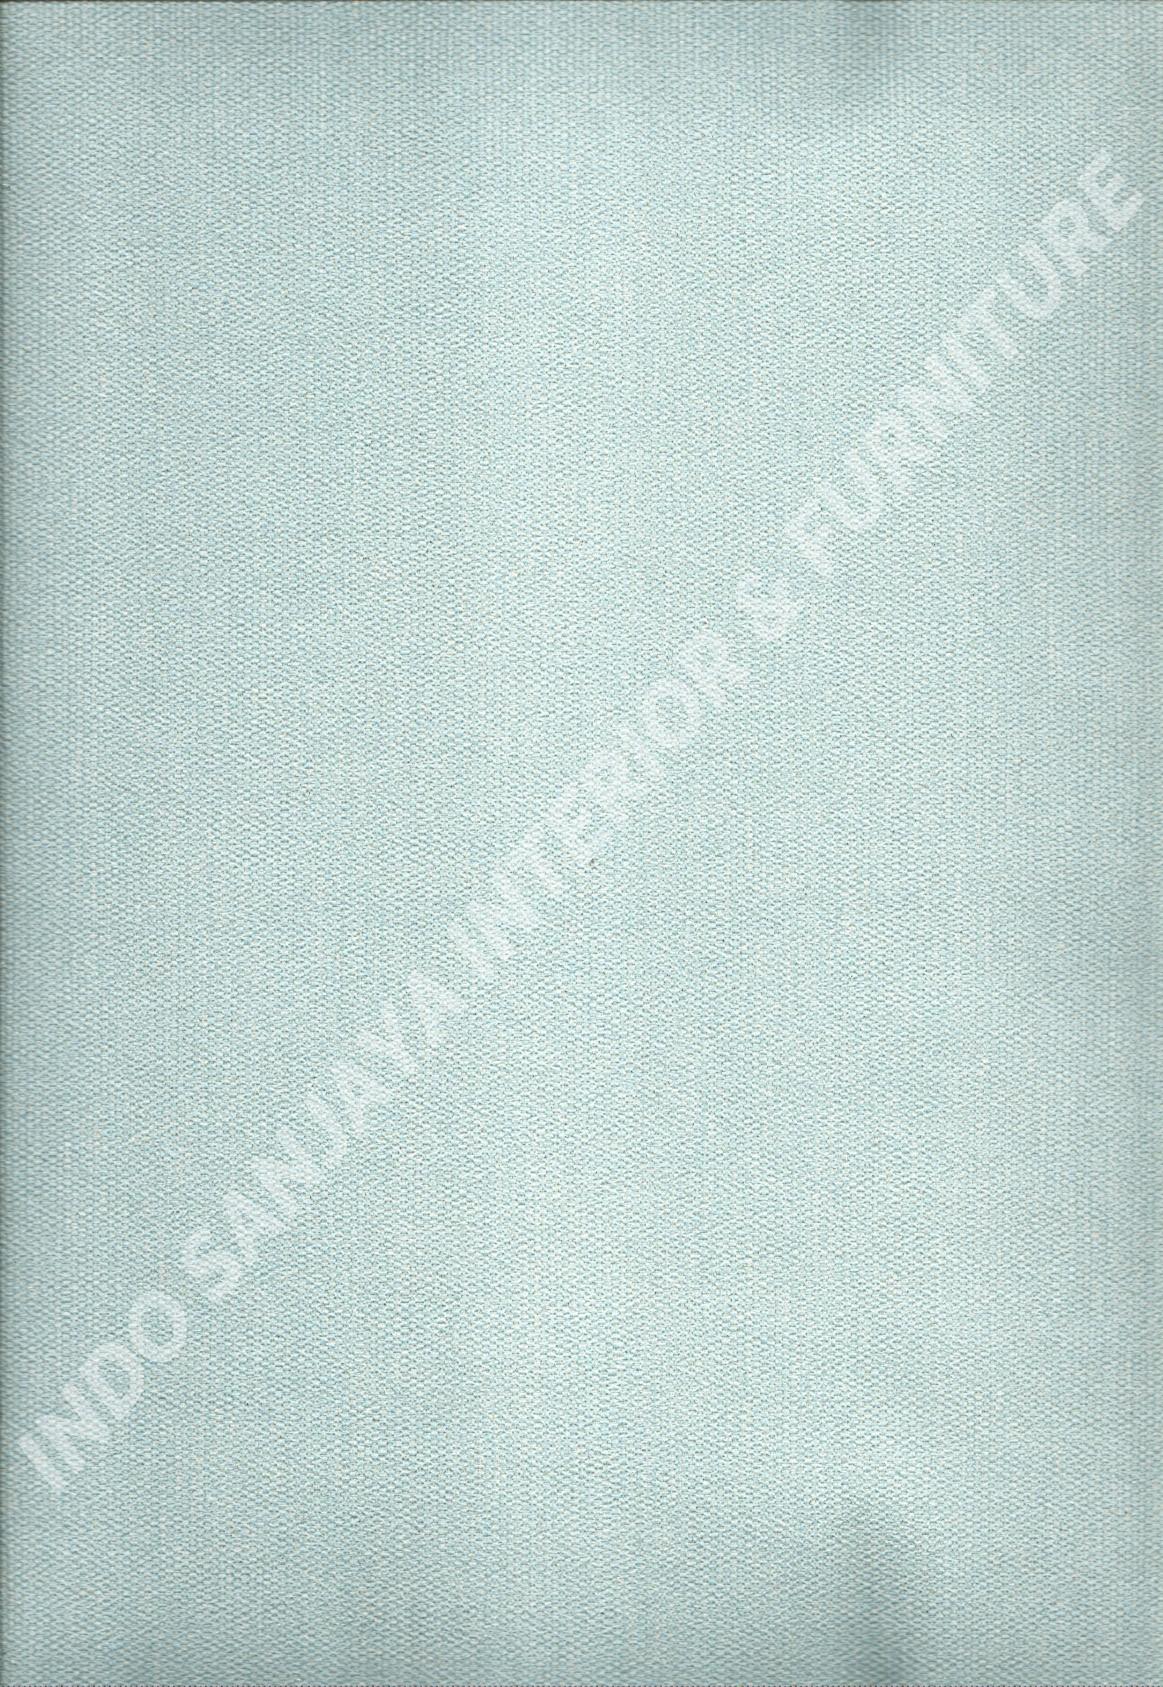 wallpaper   Wallpaper Minimalis Polos 87034:87034 corak  warna